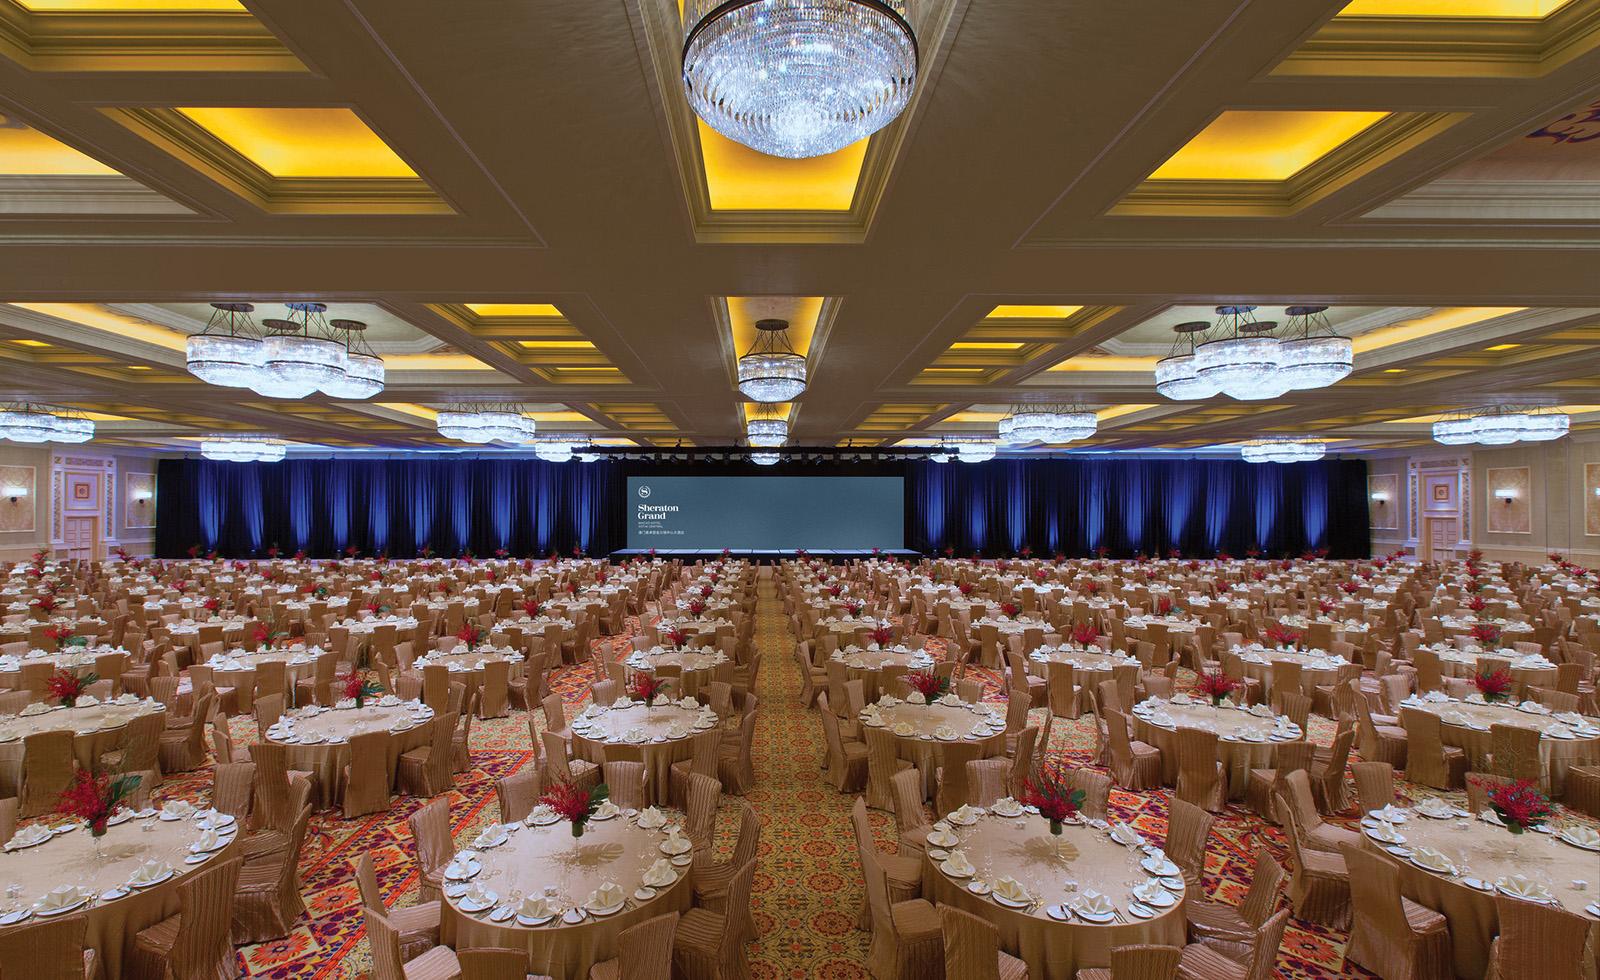 Kashgar Ballroom, banquet setup